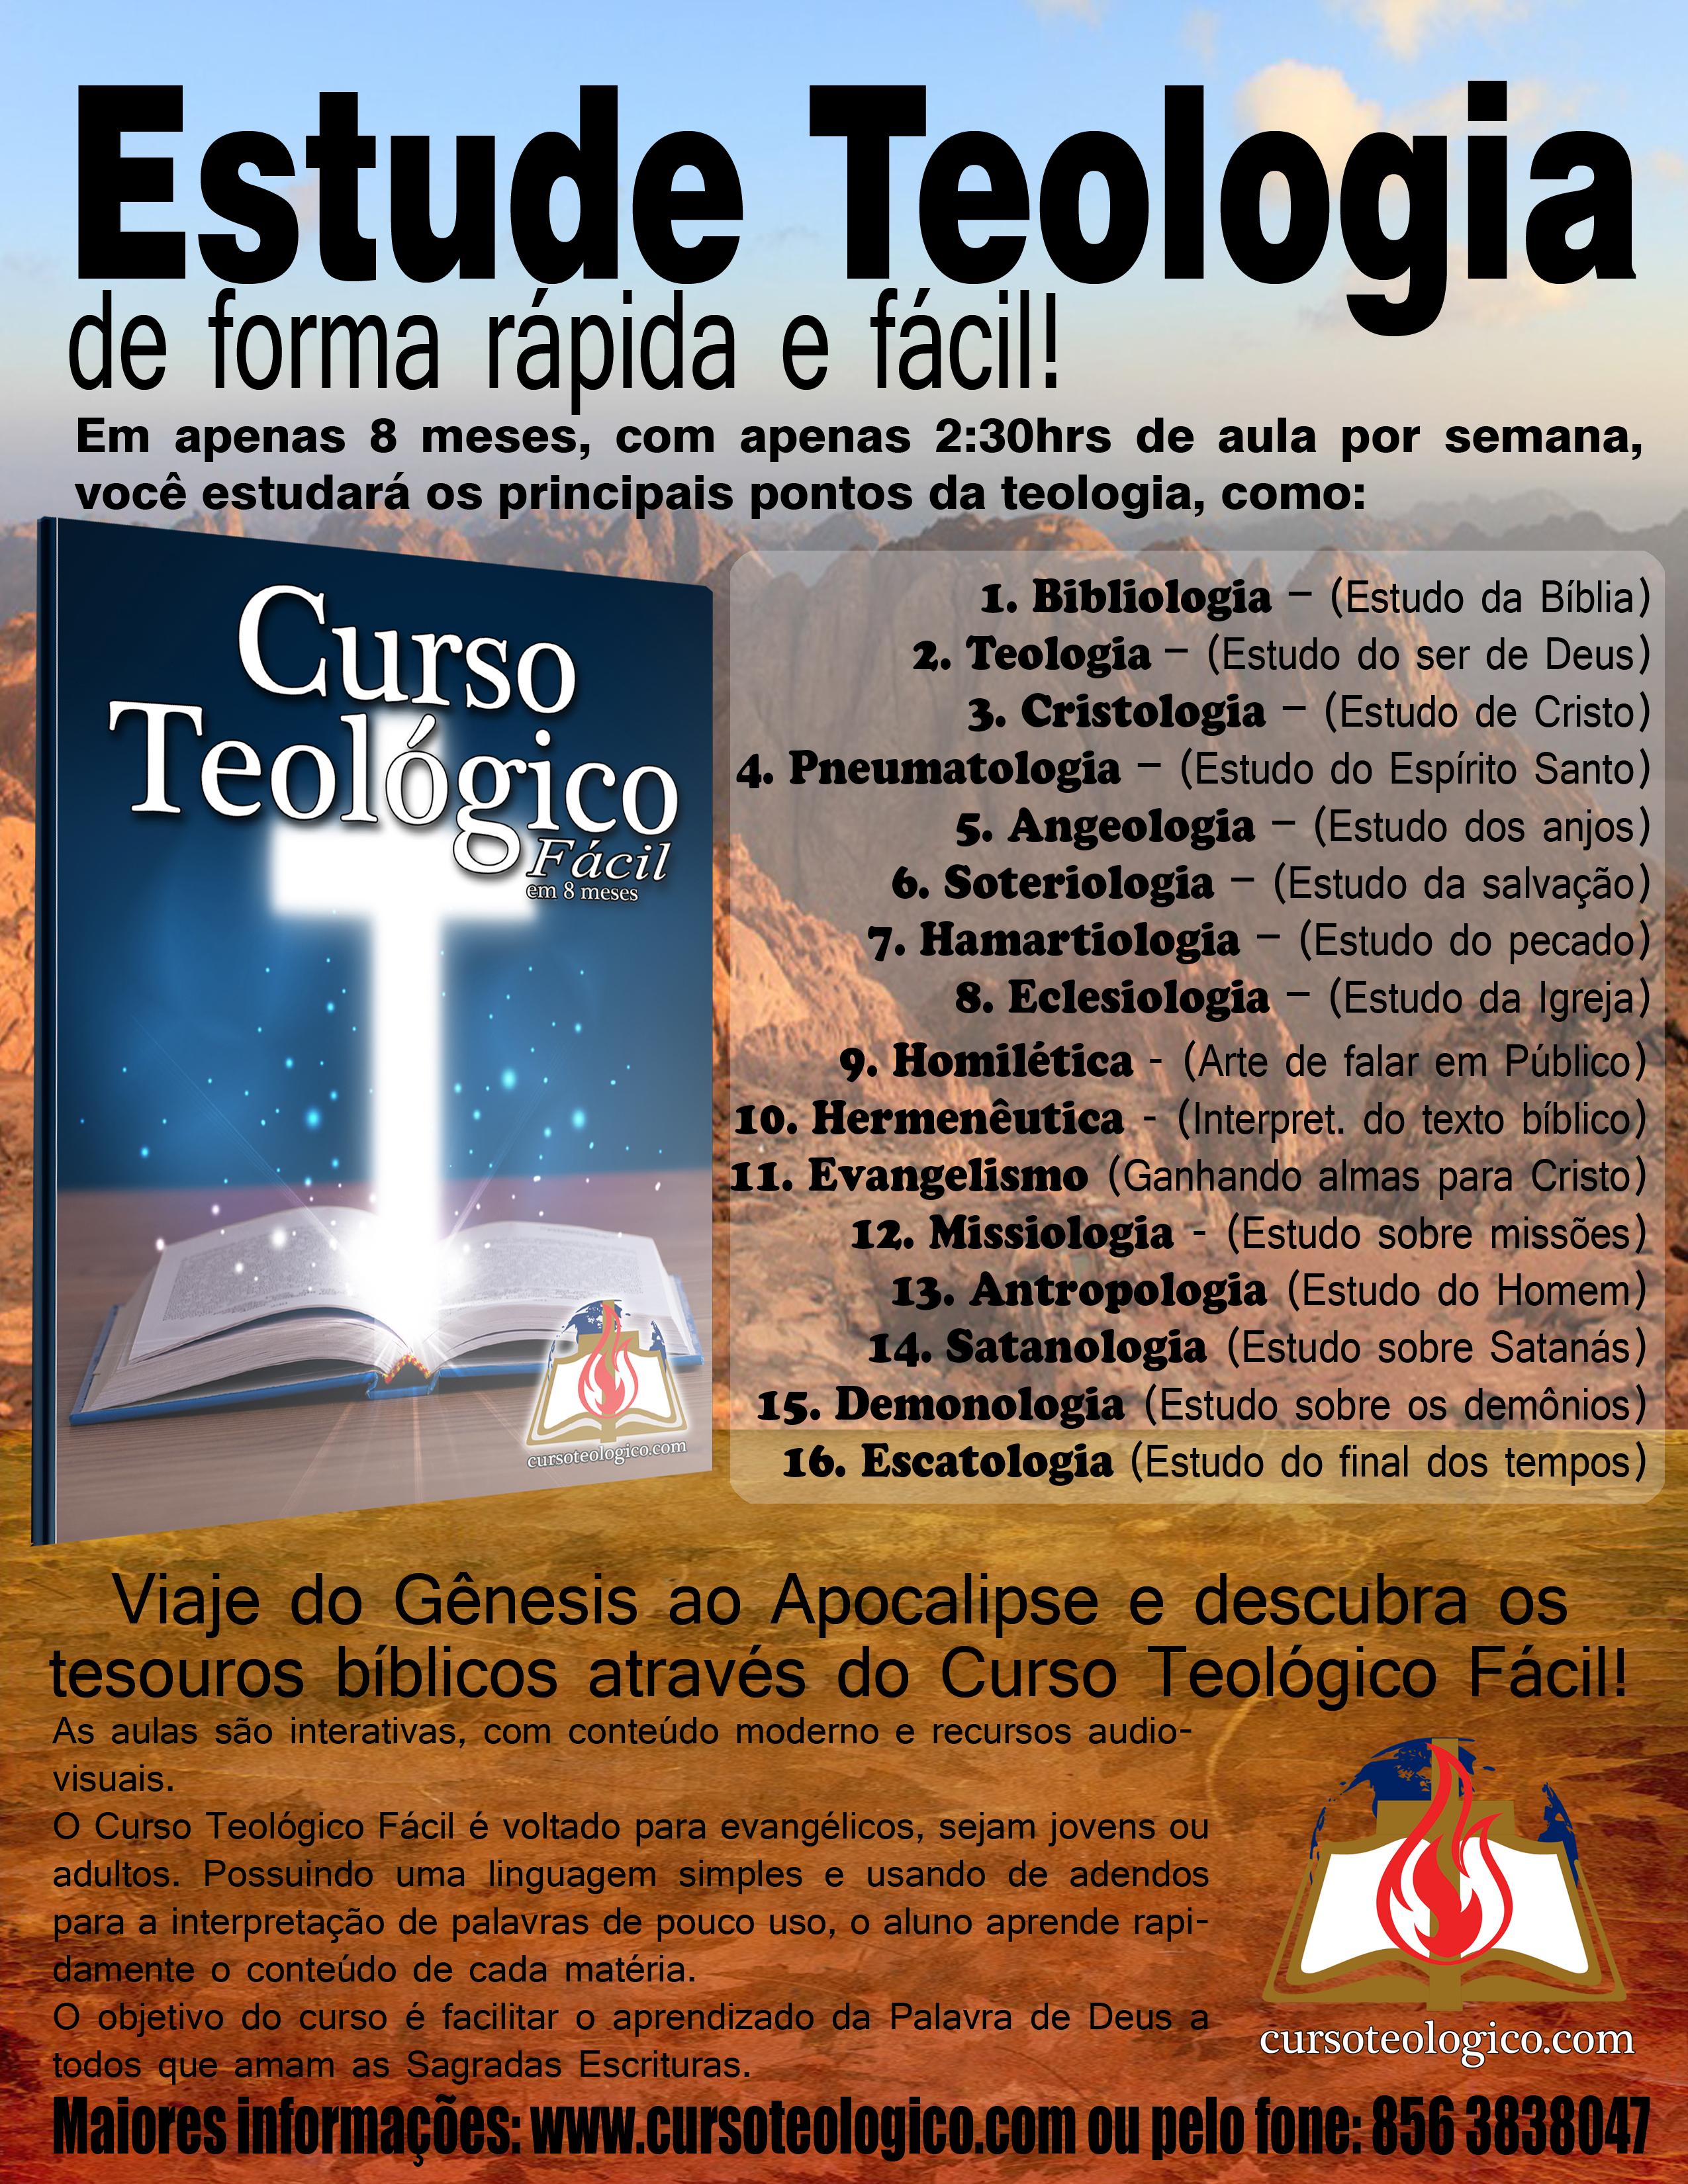 Curso Teológico Fácil - Nível I